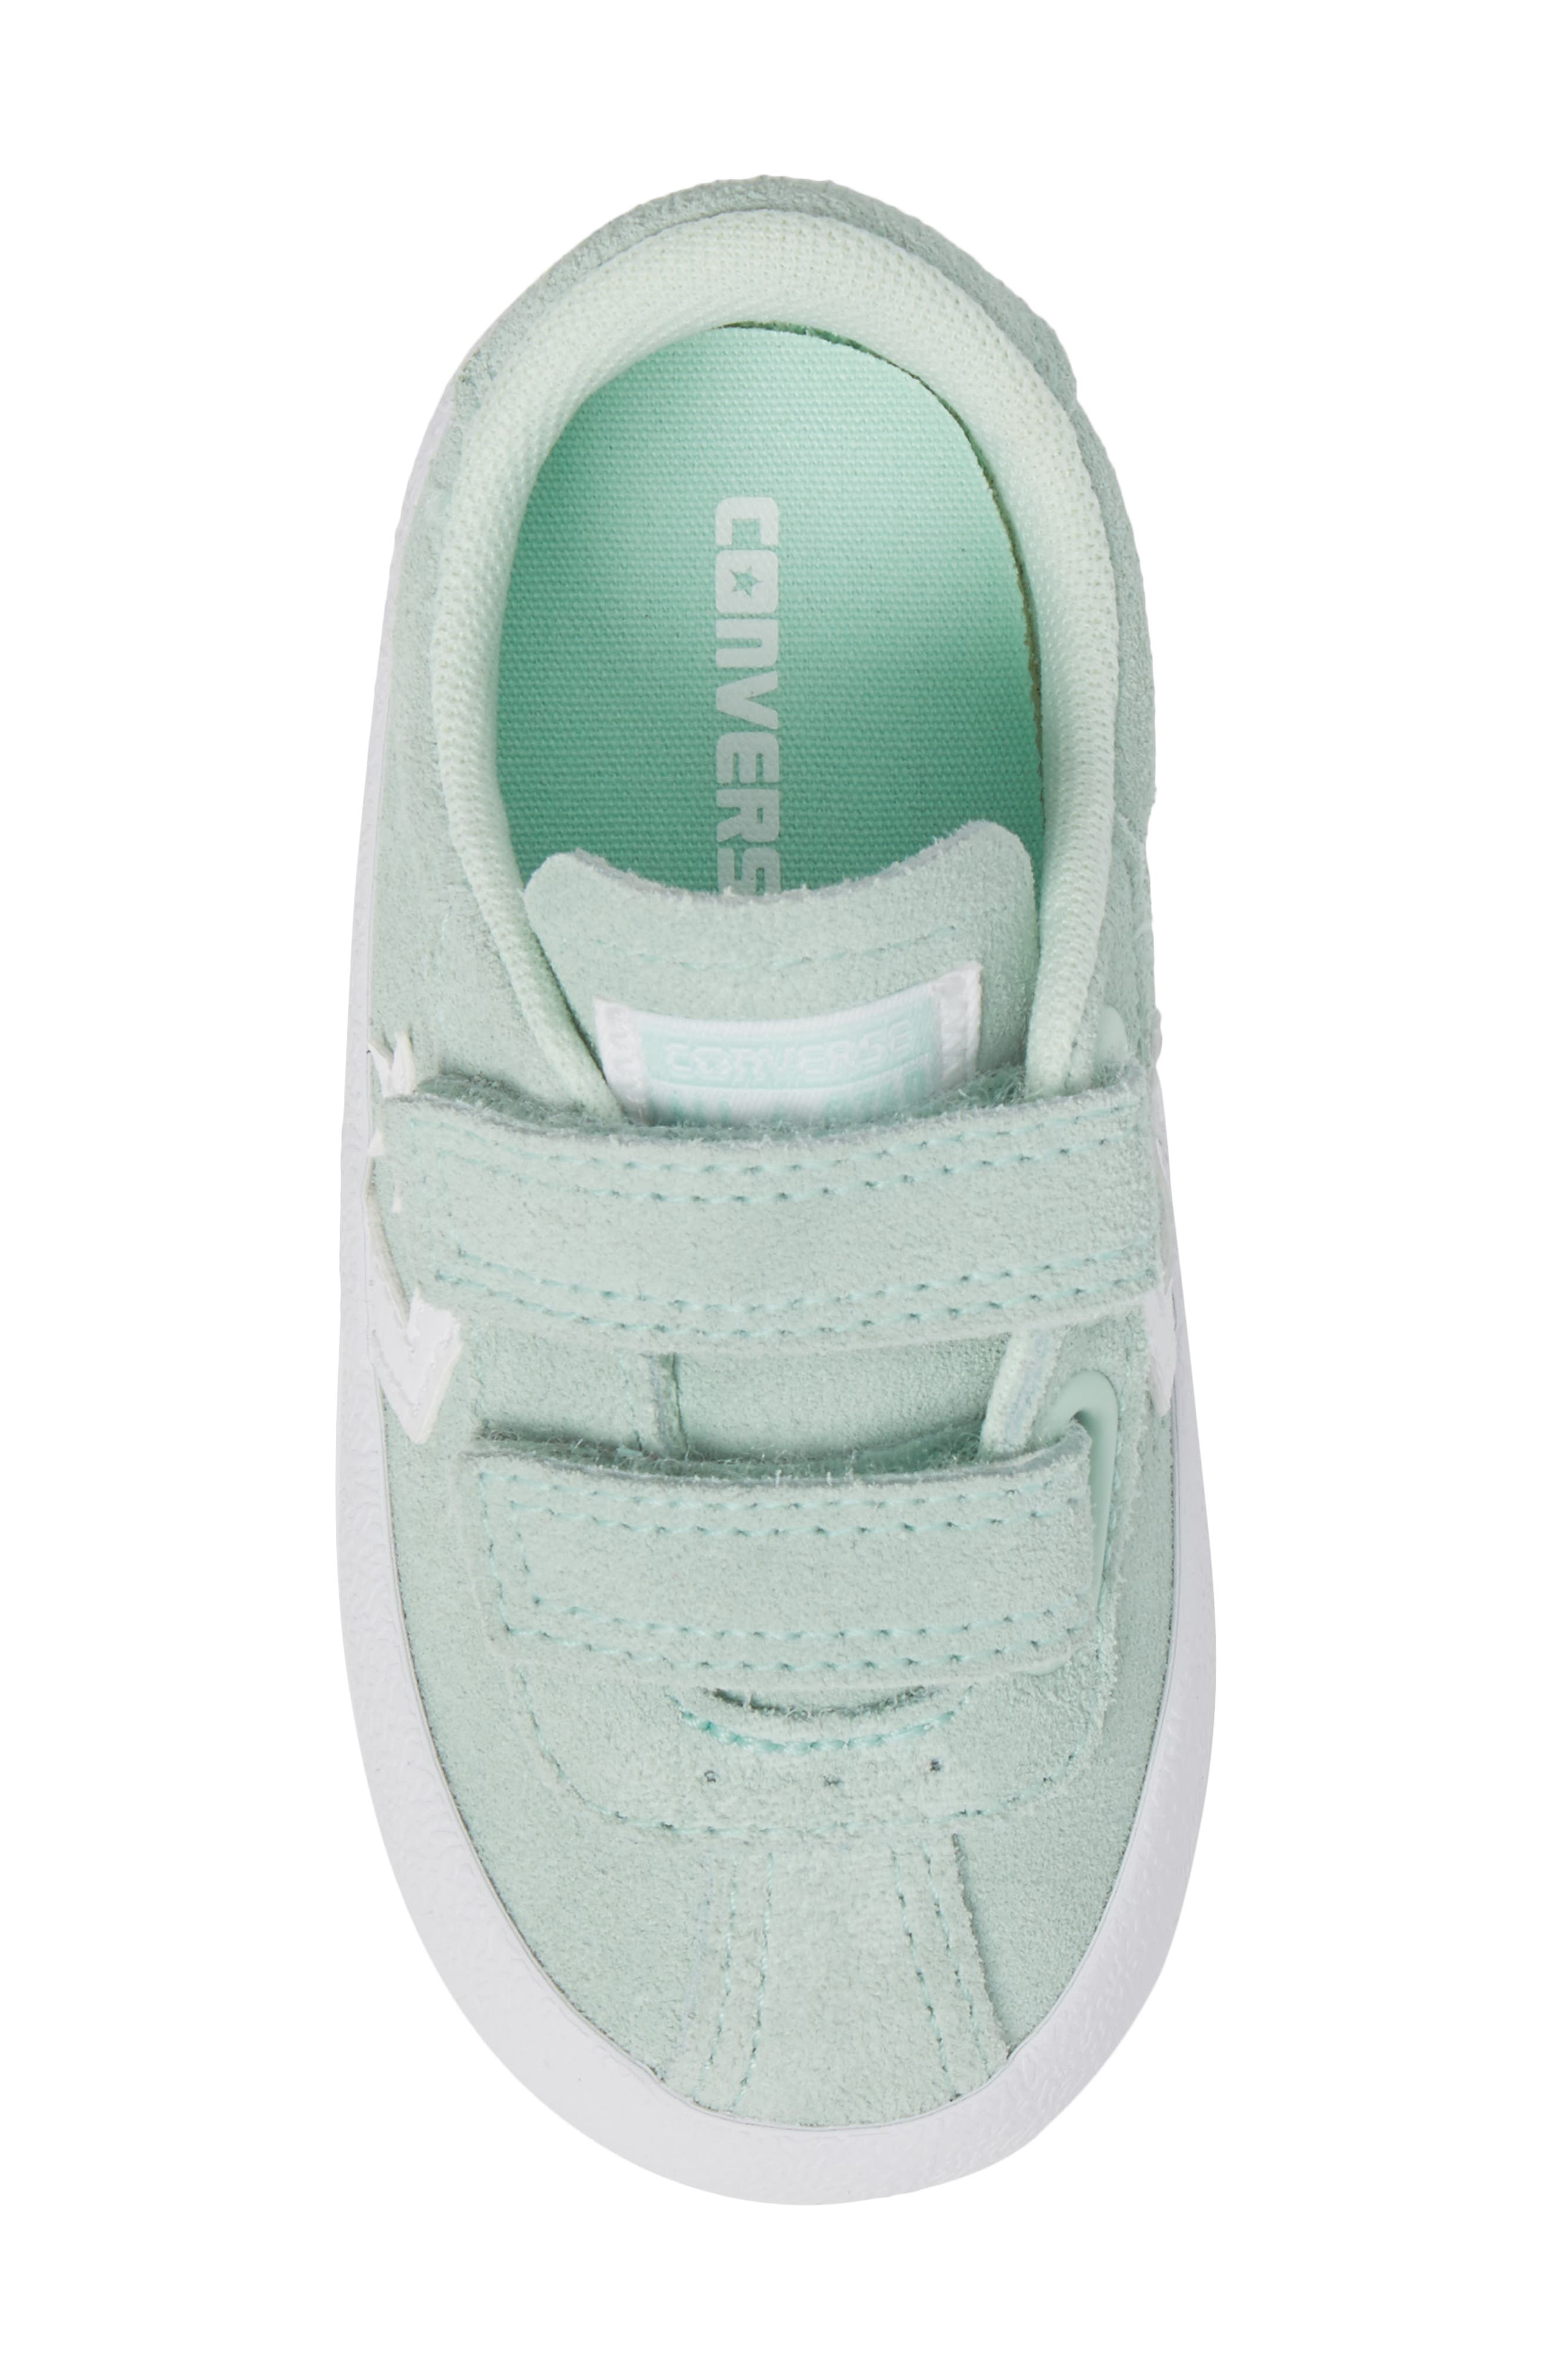 Breakpoint Sneaker,                             Alternate thumbnail 5, color,                             300